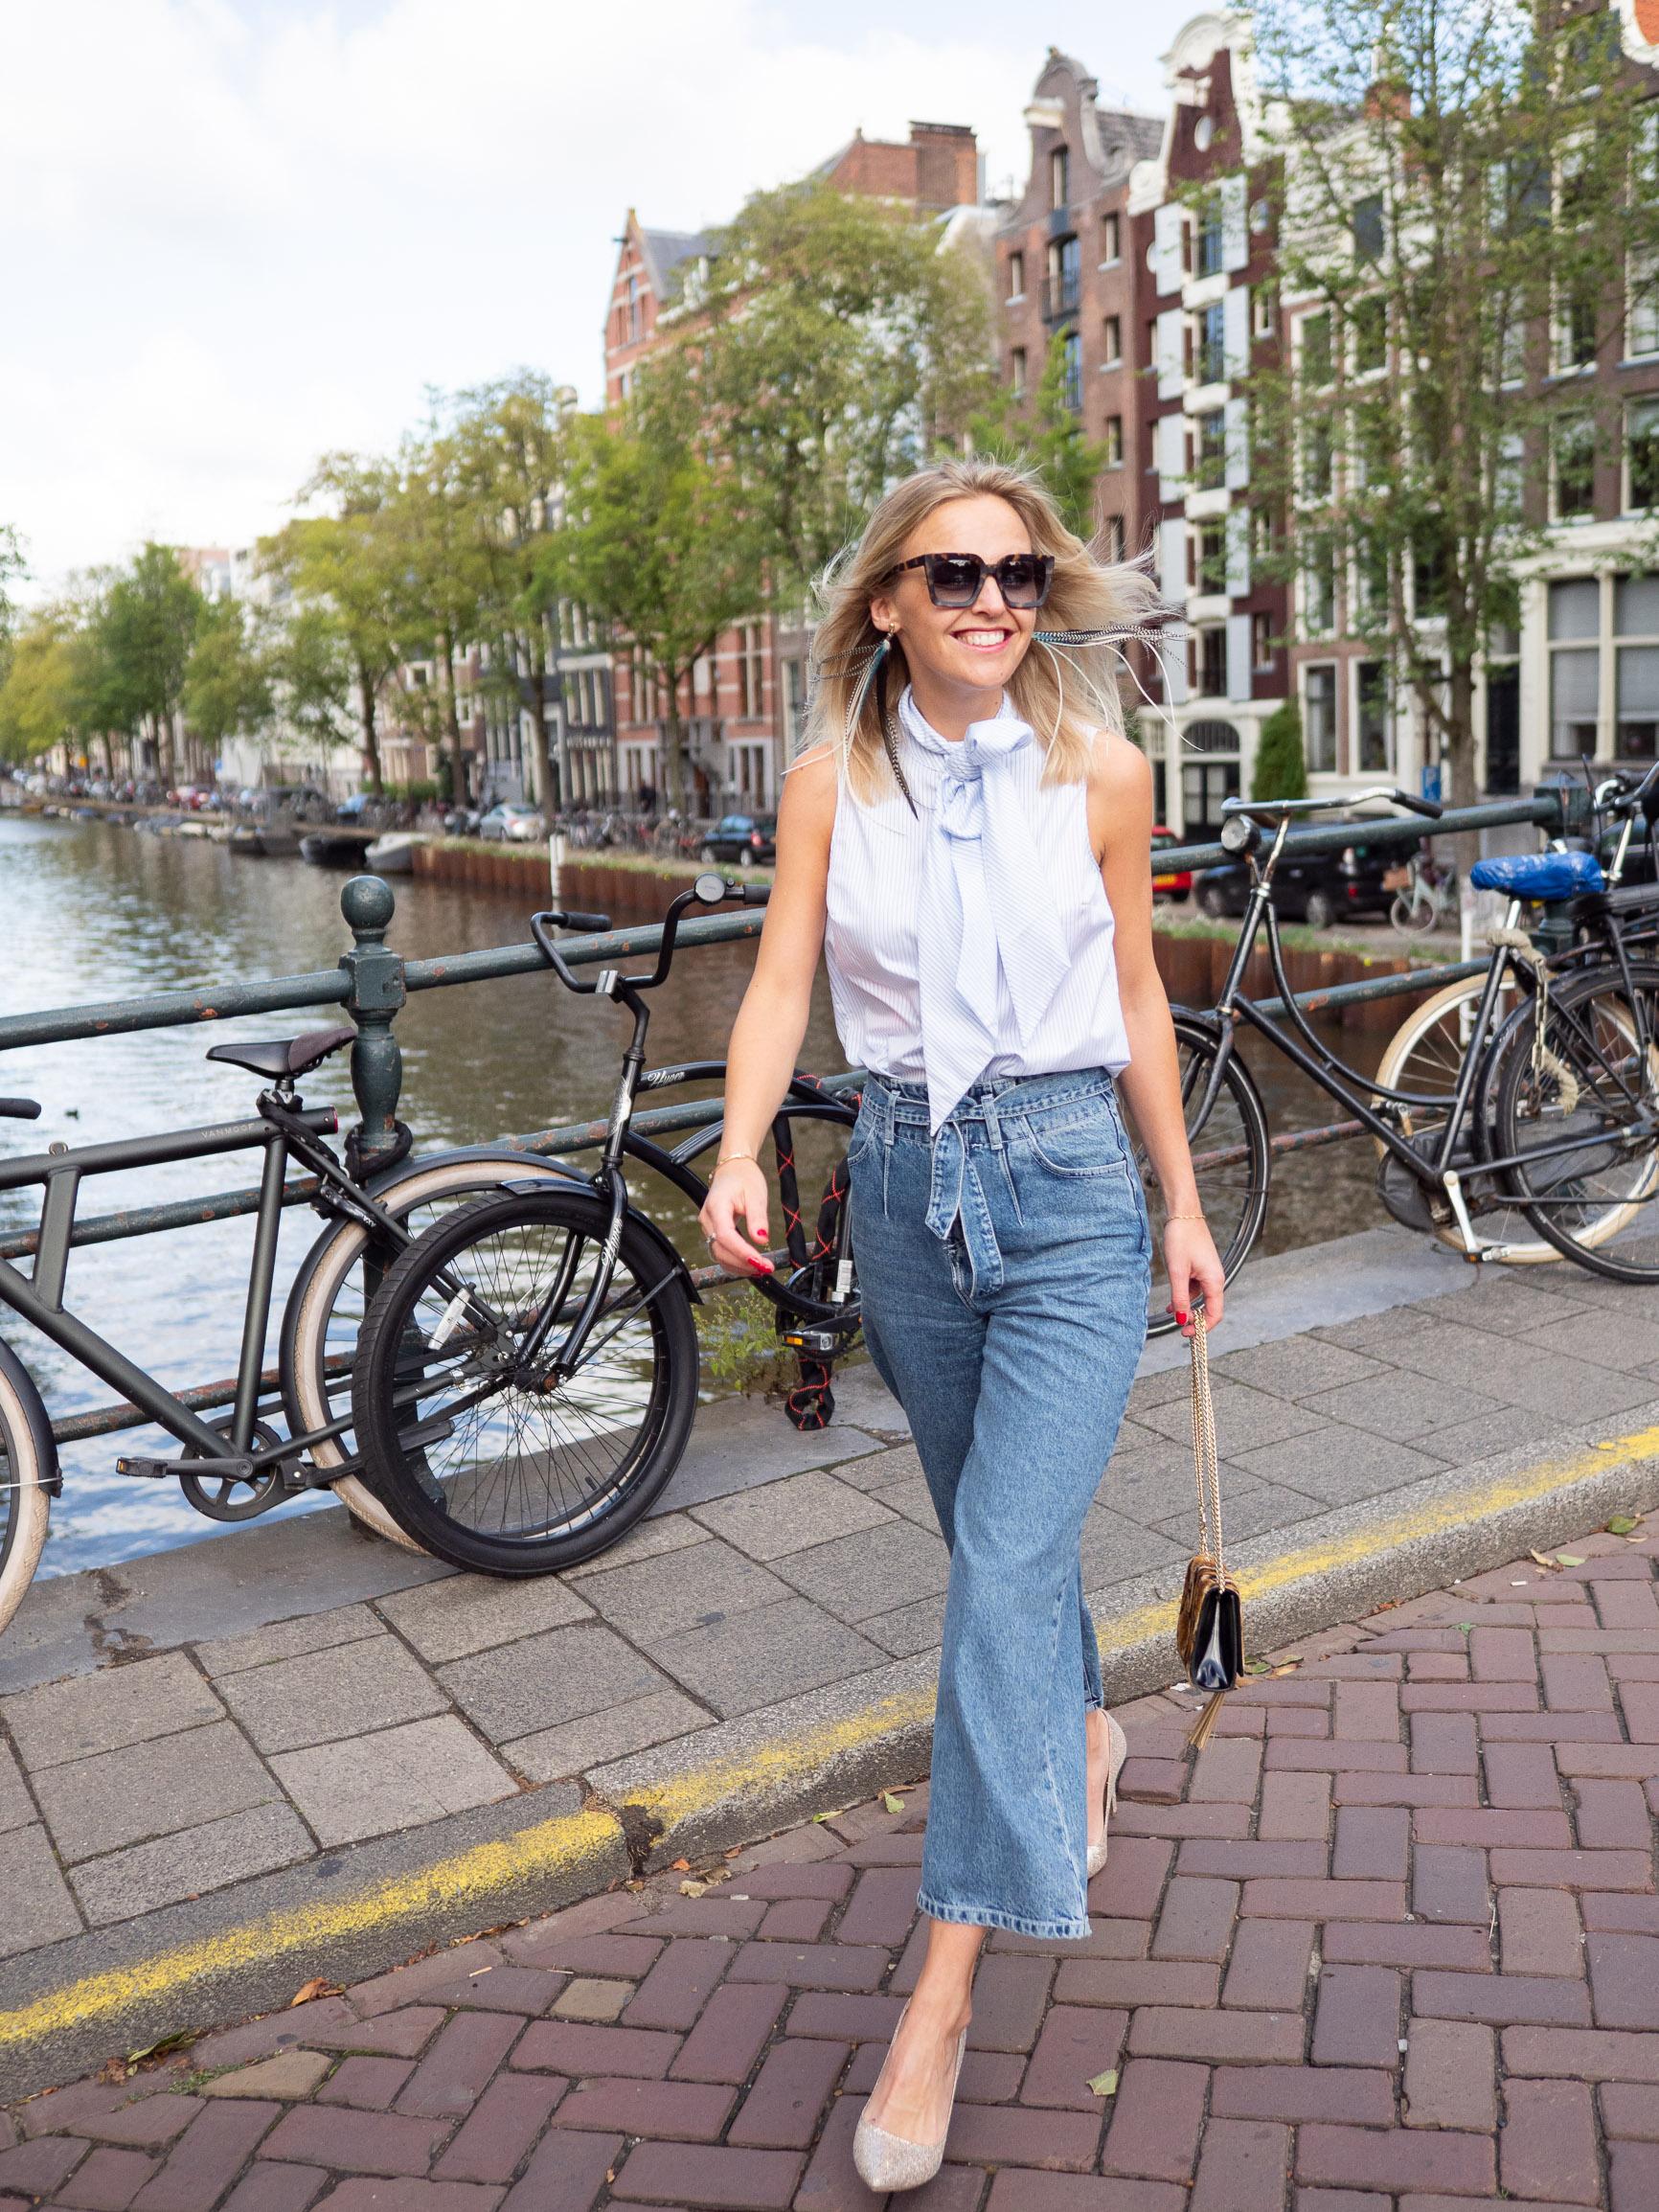 BAGATYOU_Suzanne_Bavinck_Bender_Blogger_Fashion_Amsterdam_By_Marinke_Davelaar-9058335